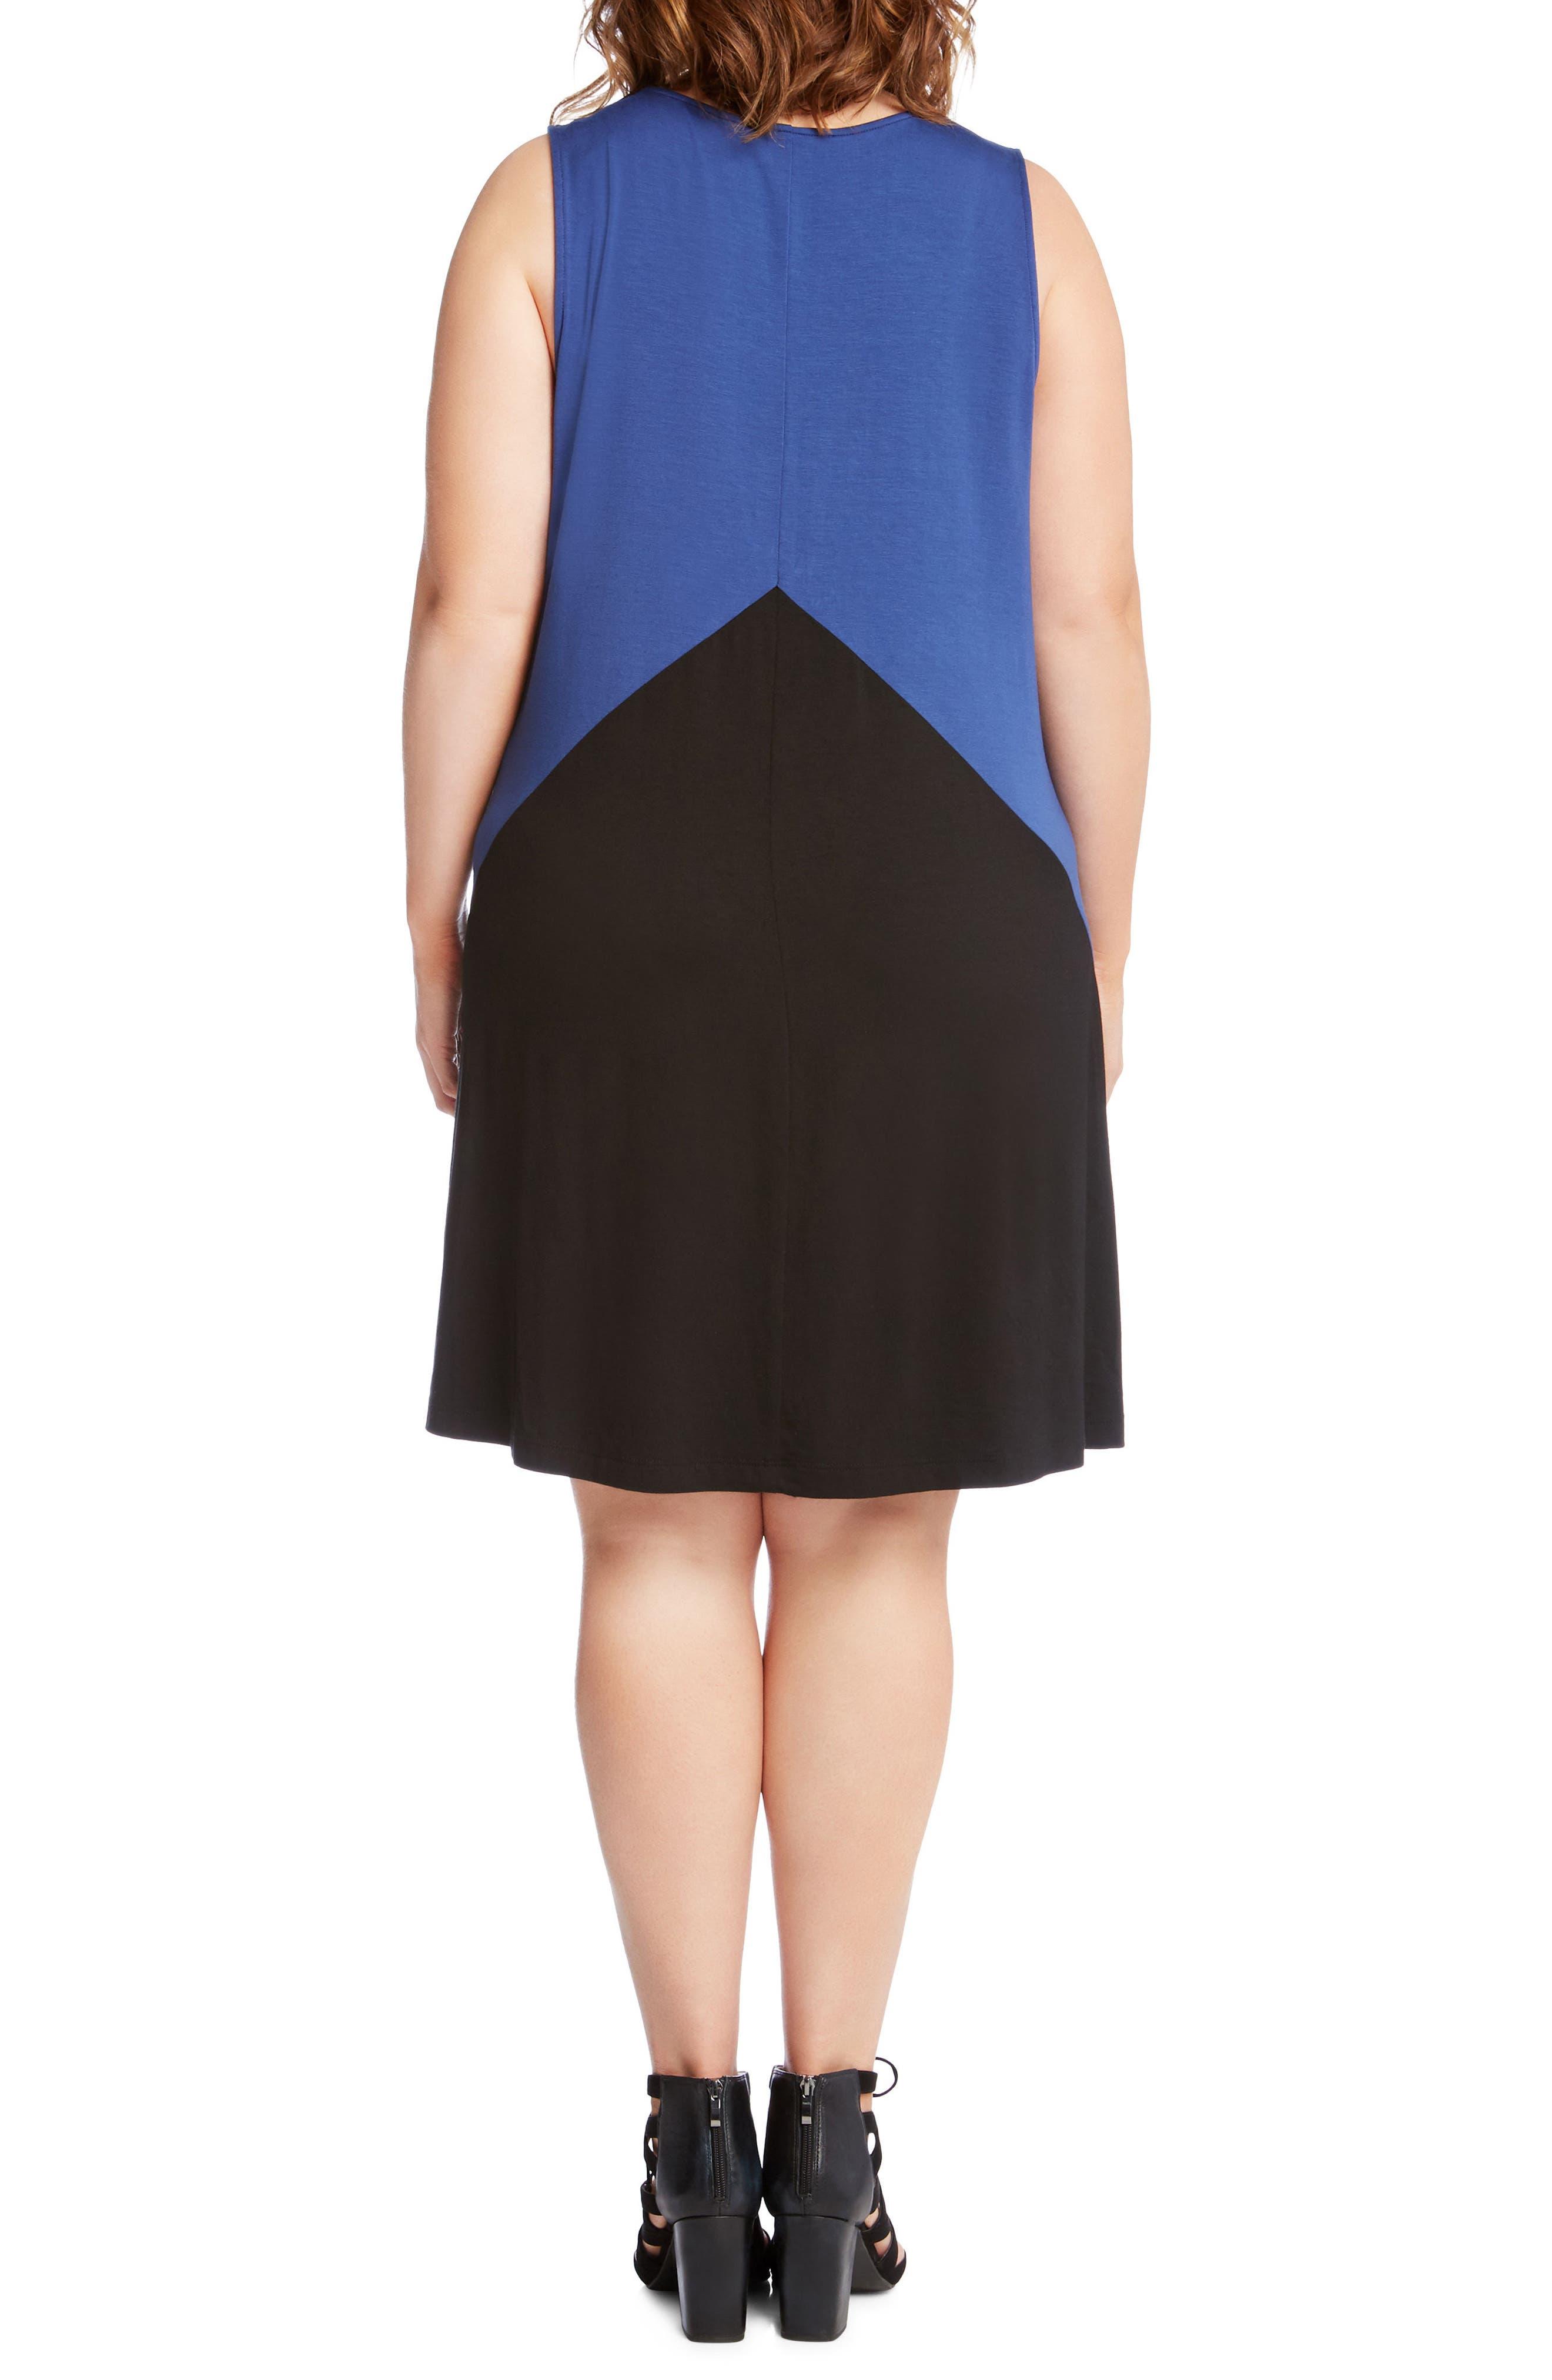 Colorblock Shift Dress,                             Alternate thumbnail 2, color,                             Blue With Black